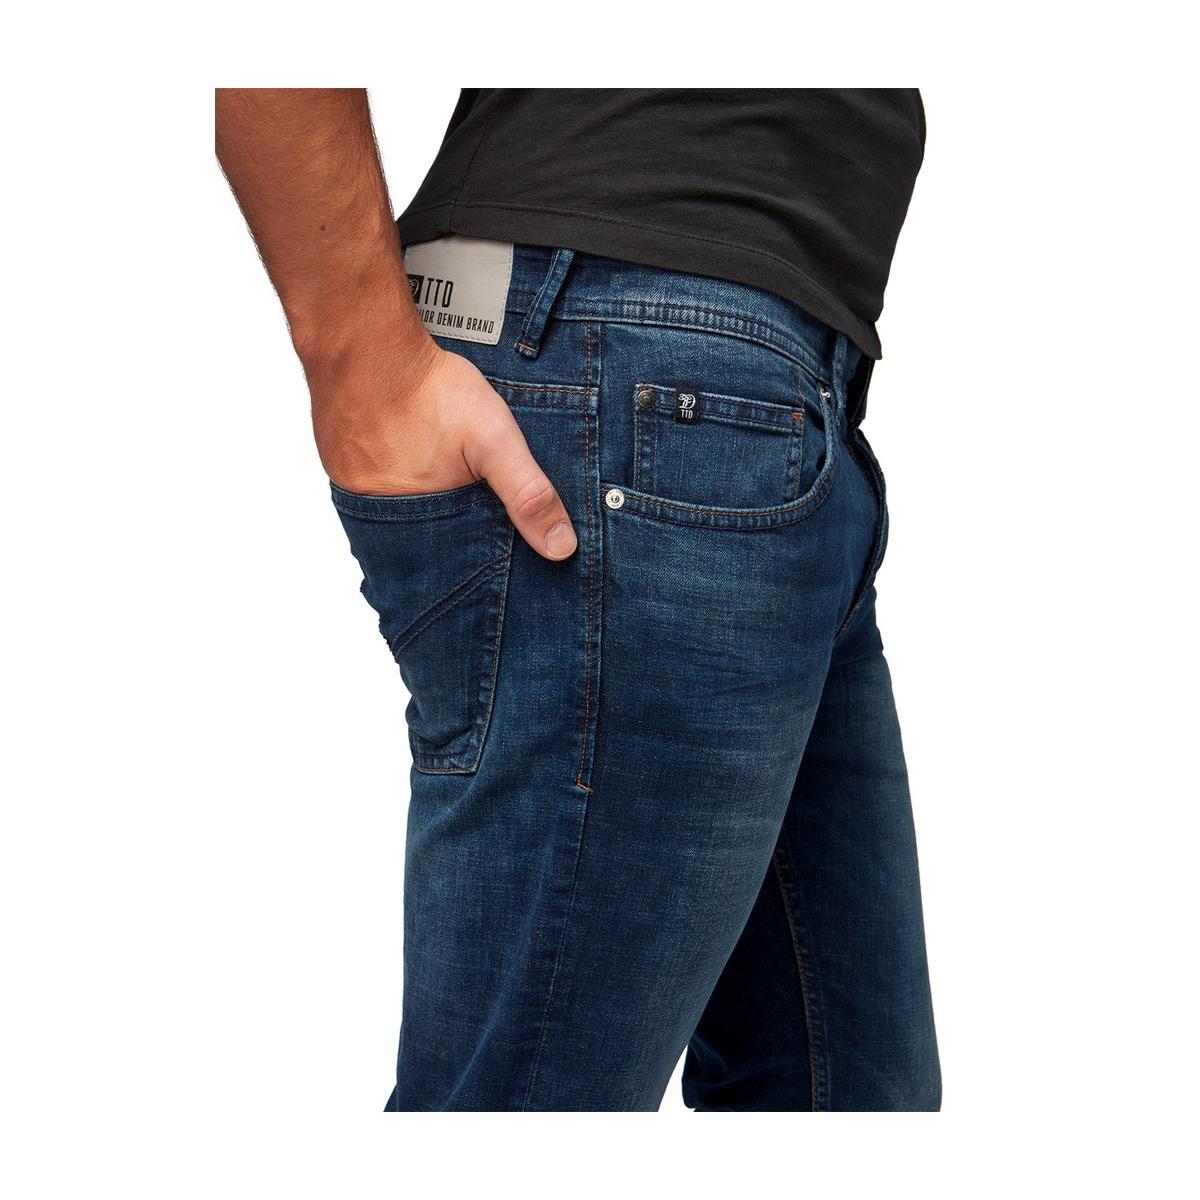 jeans piers super slim 1008446xx12 tom tailor jeans 10282